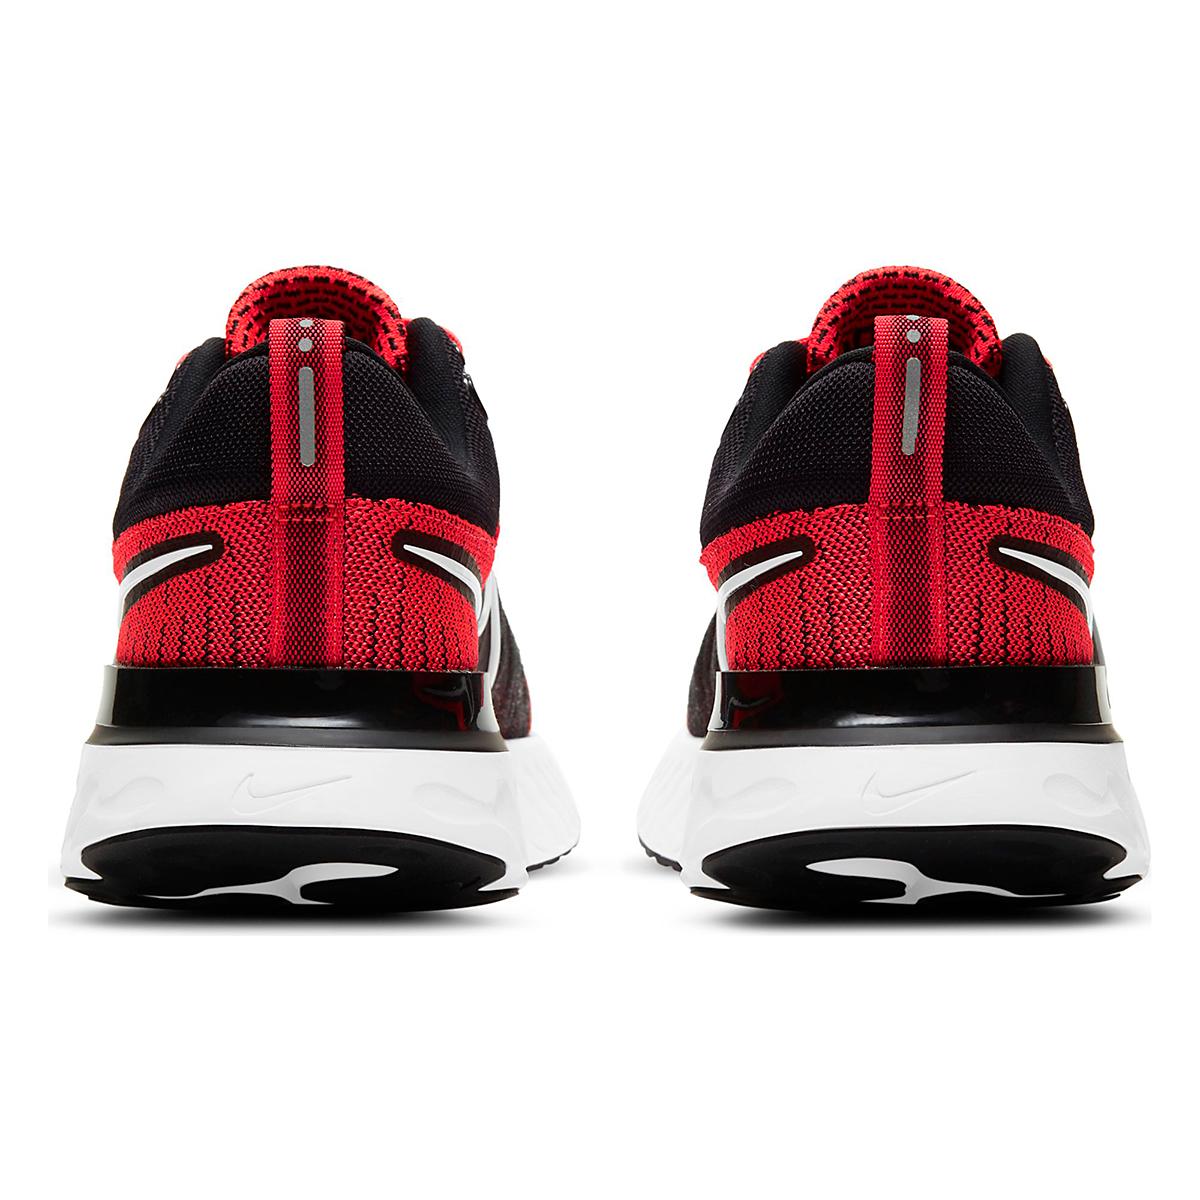 Men's Nike React Infinity Run Flyknit 2 Running Shoe - Color: Bright Crimson/White/Black/Smike Grey - Size: 6 - Width: Regular, Bright Crimson/White/Black/Smike Grey, large, image 4